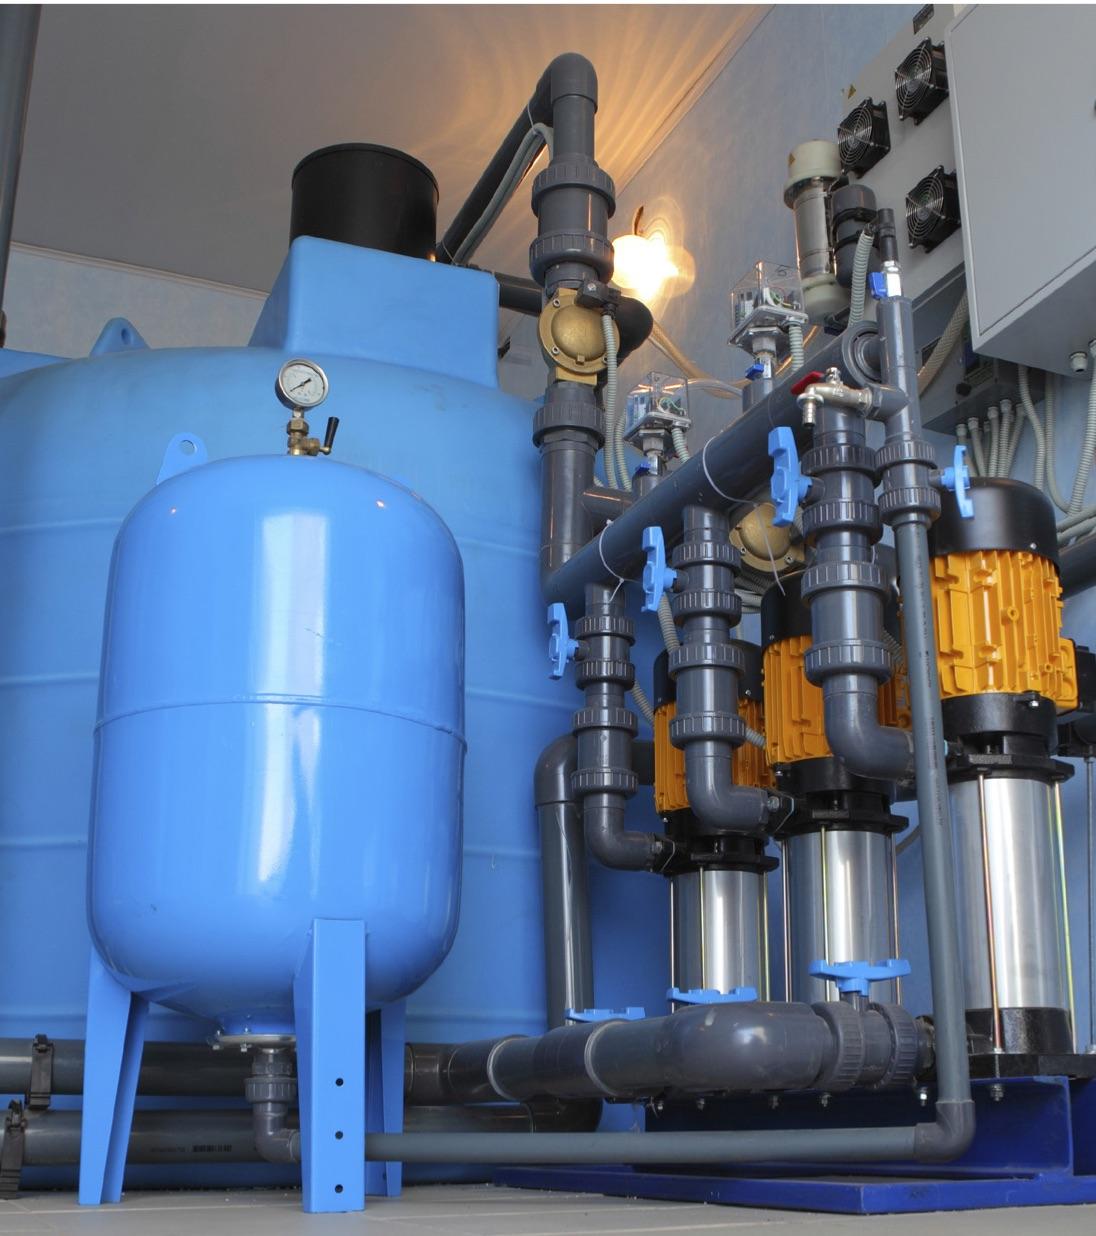 Aquatic Facility Operator Certification Course